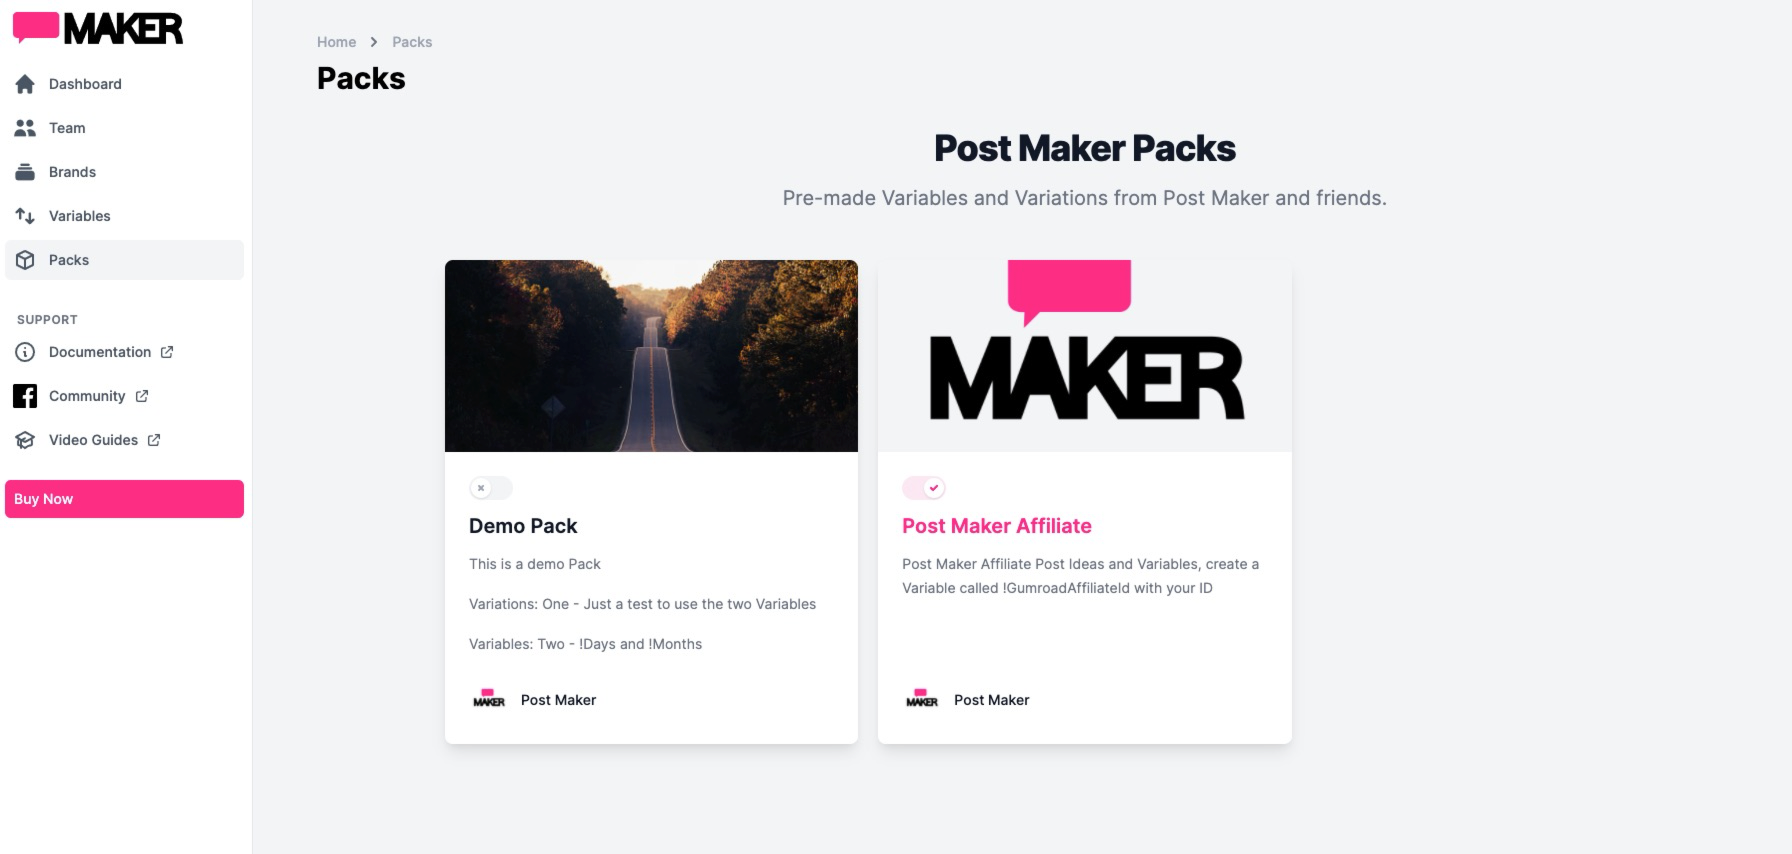 Post Maker Affiliate Pack